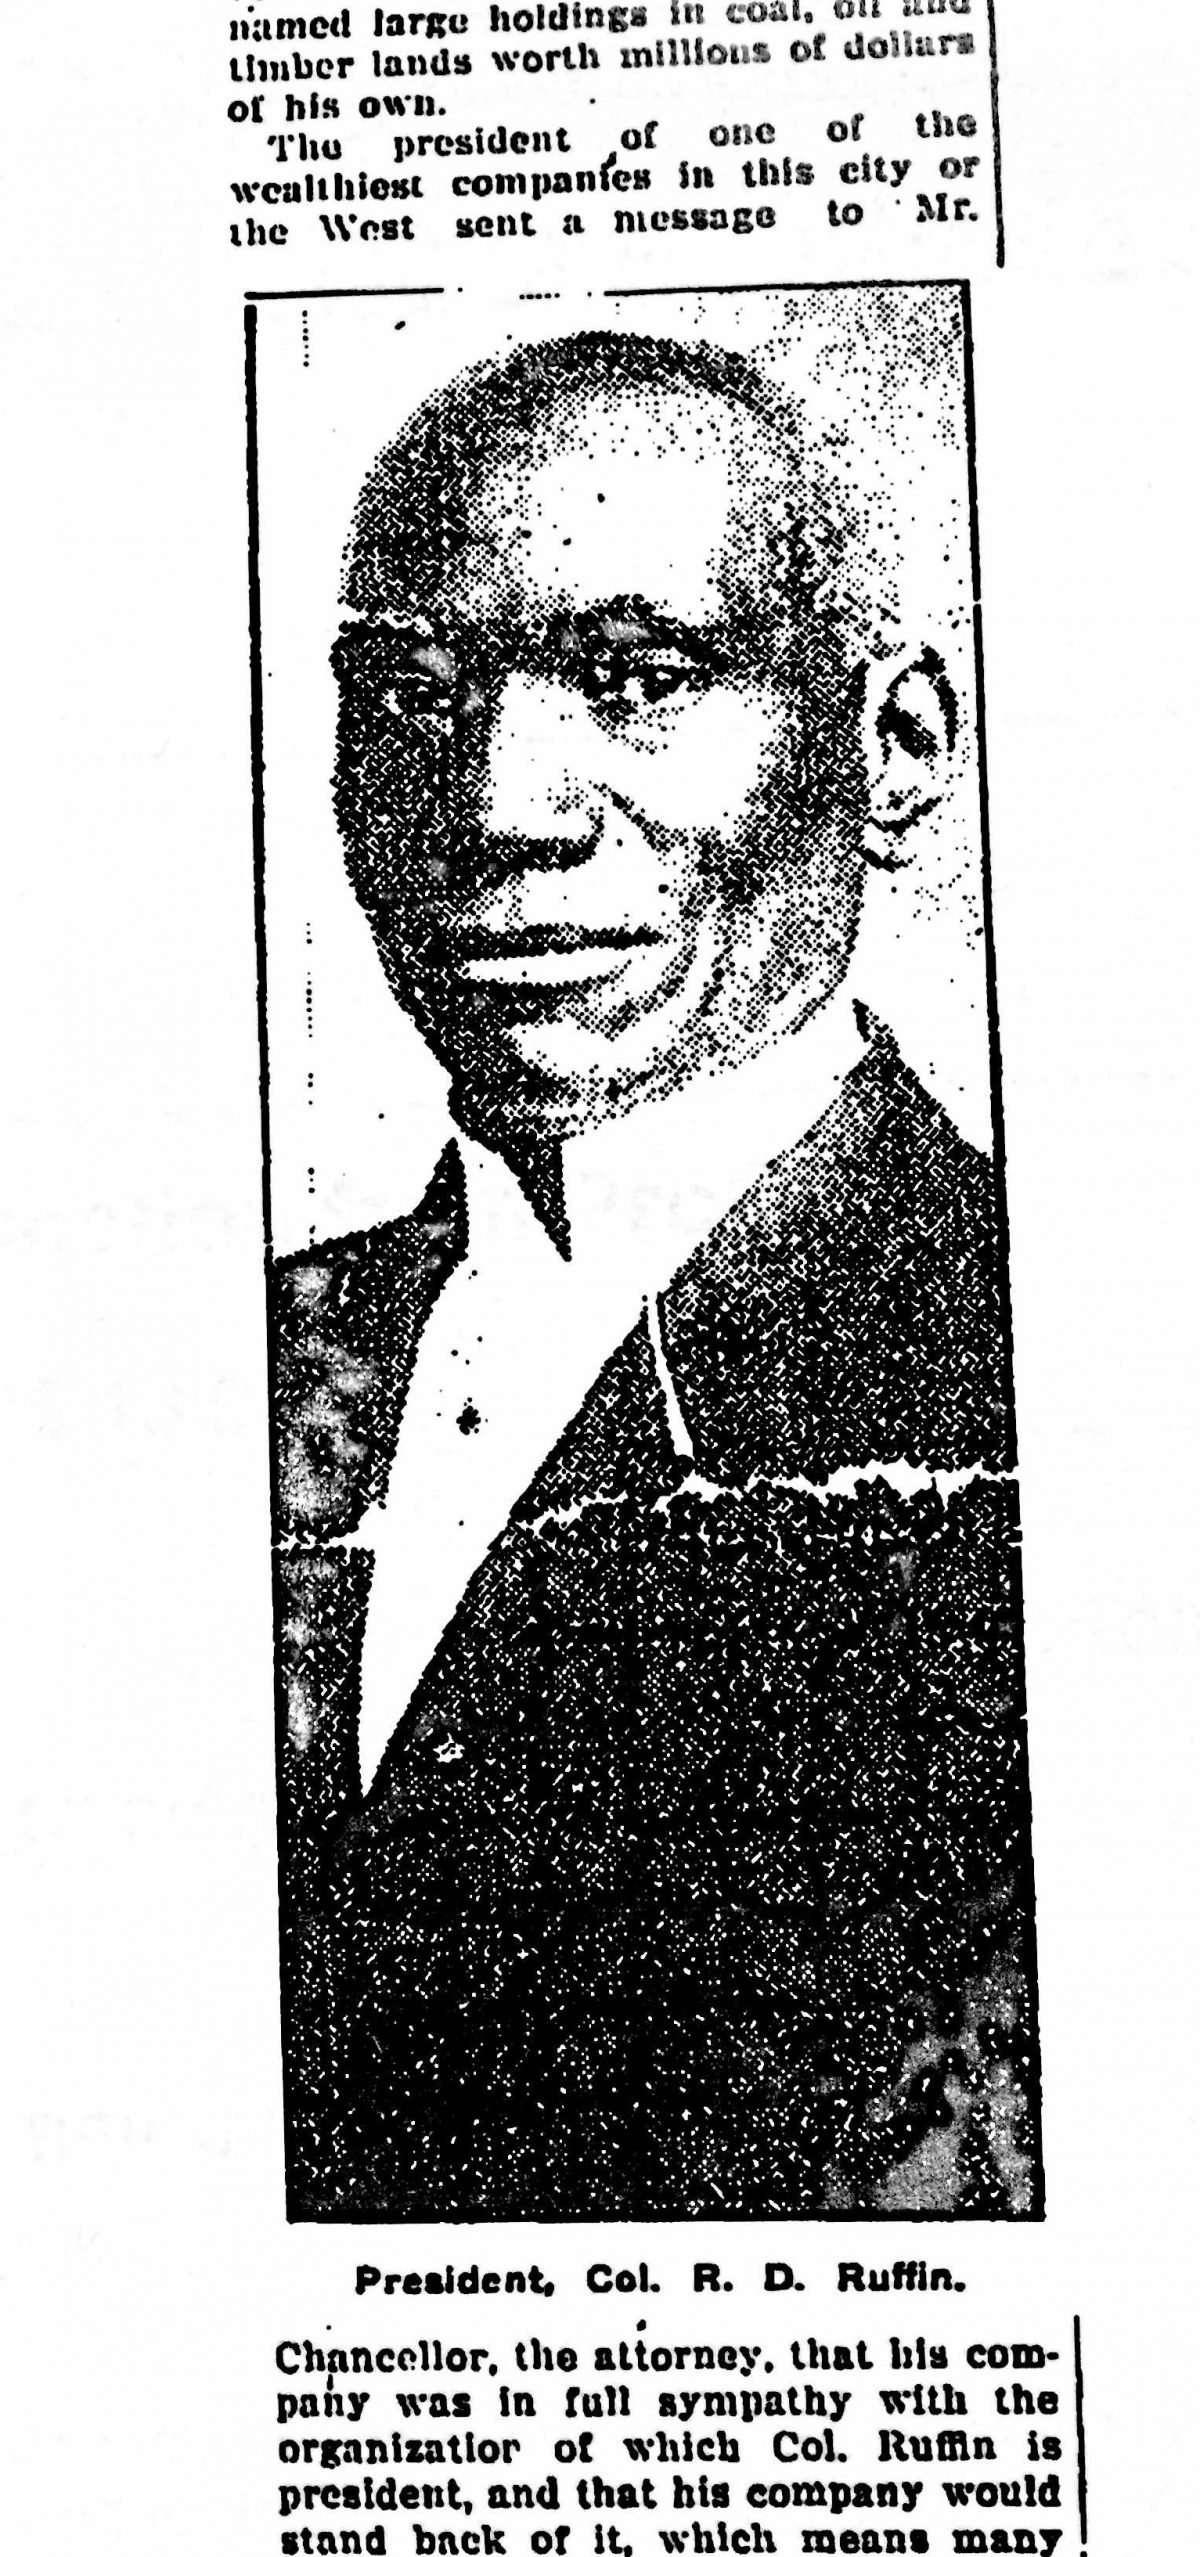 R. D. Ruffin